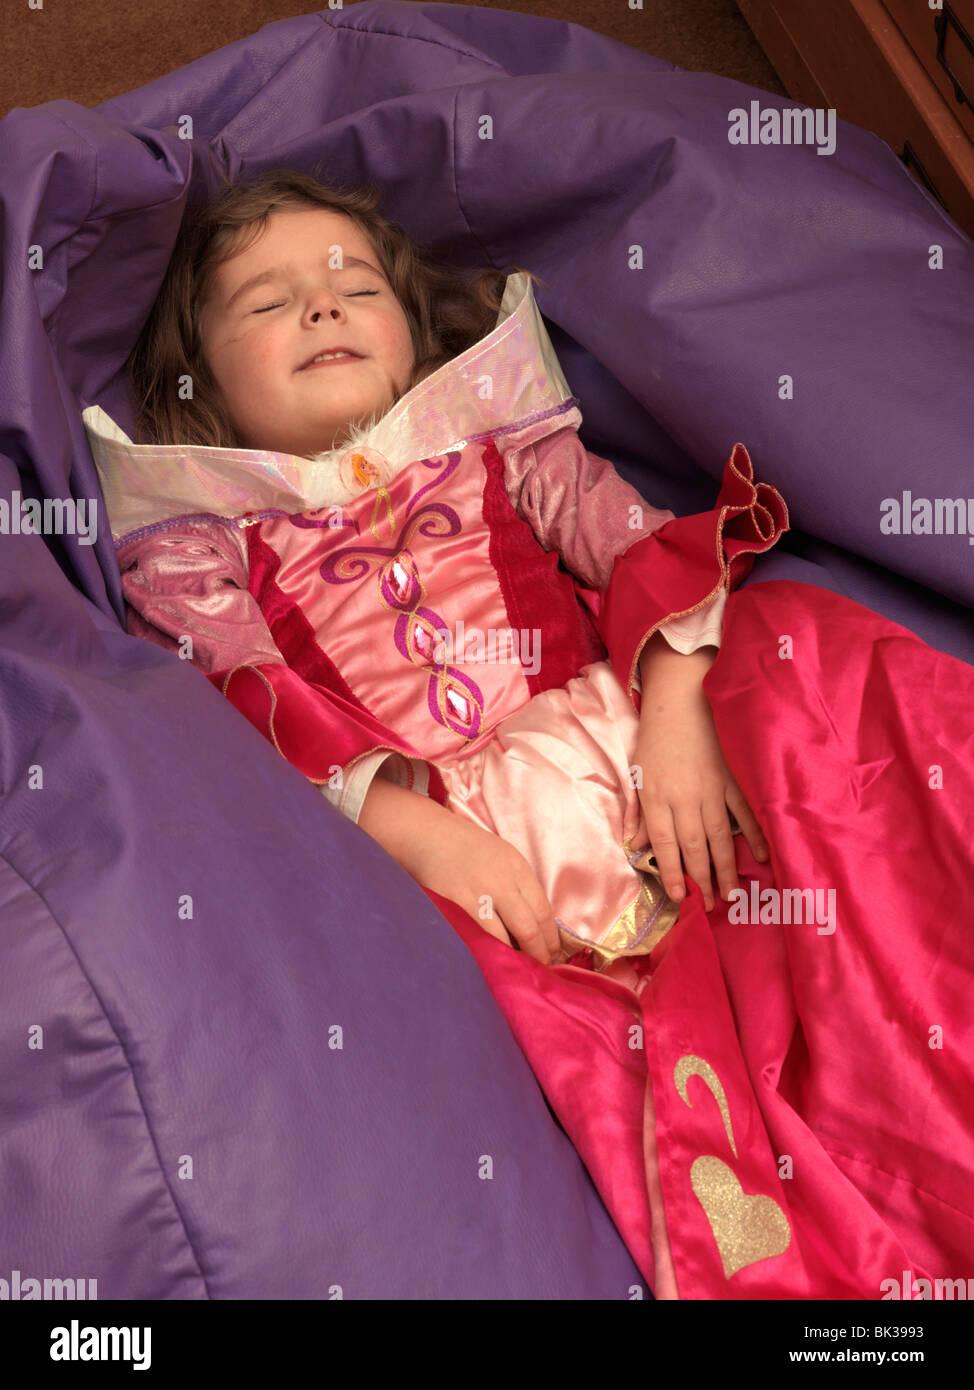 Young Girl Sleeping On Bean Bag In Princess Costume England Stock Photo